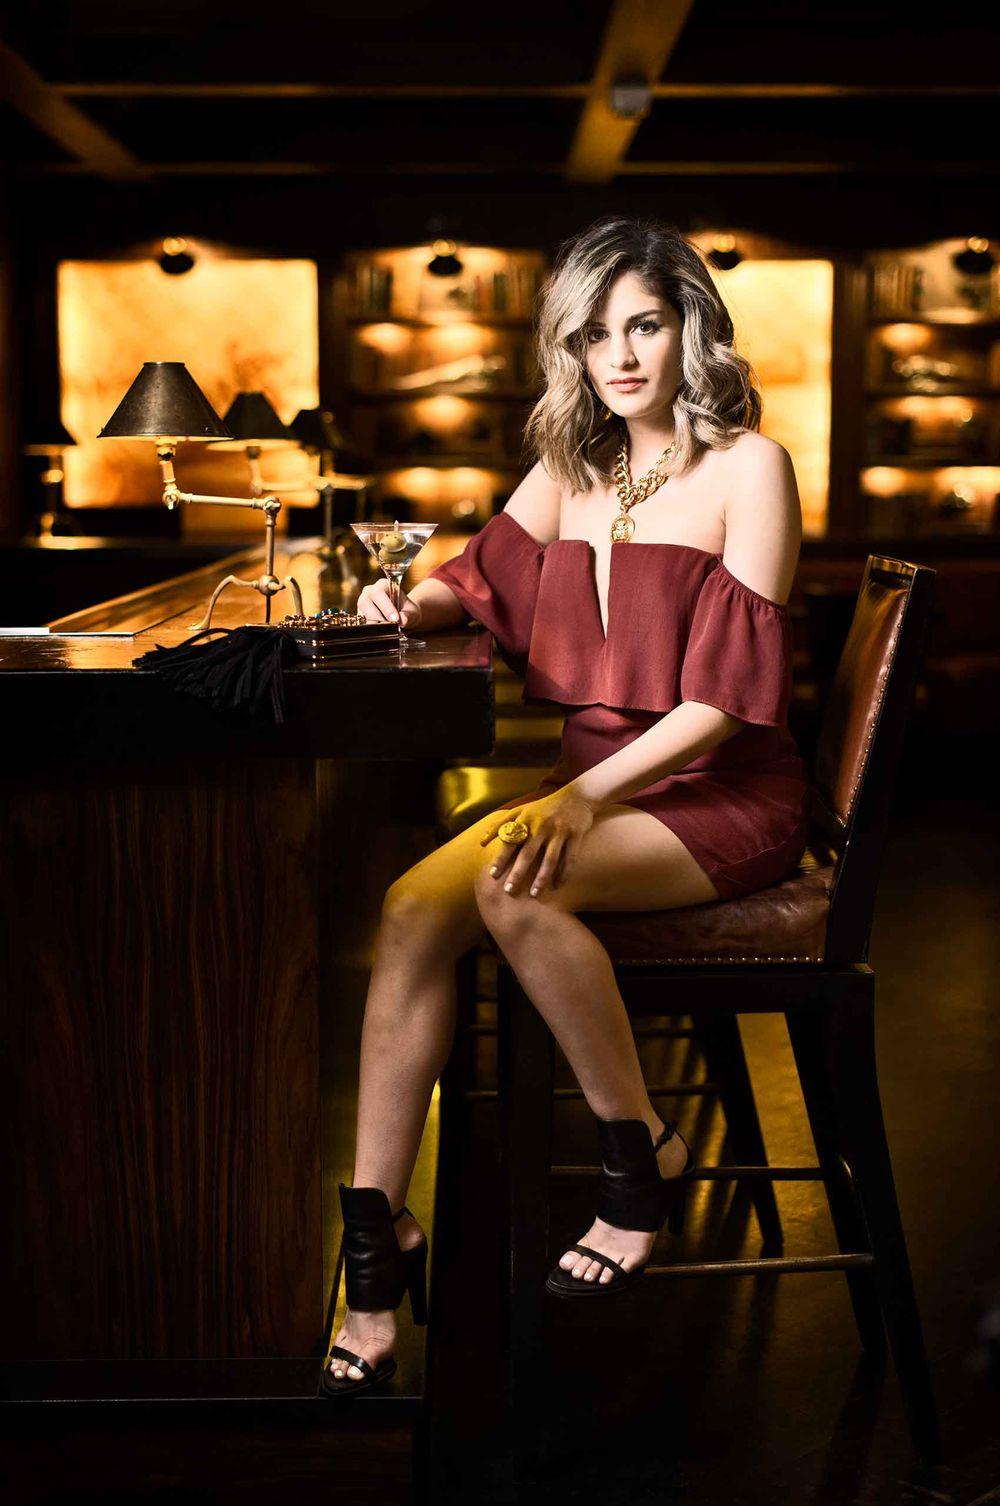 Blogger-MishaFazeli-at-Mansionbar-RosewoodHotels-Dallas-Texas-by-HenrikOlundPhotography.jpg